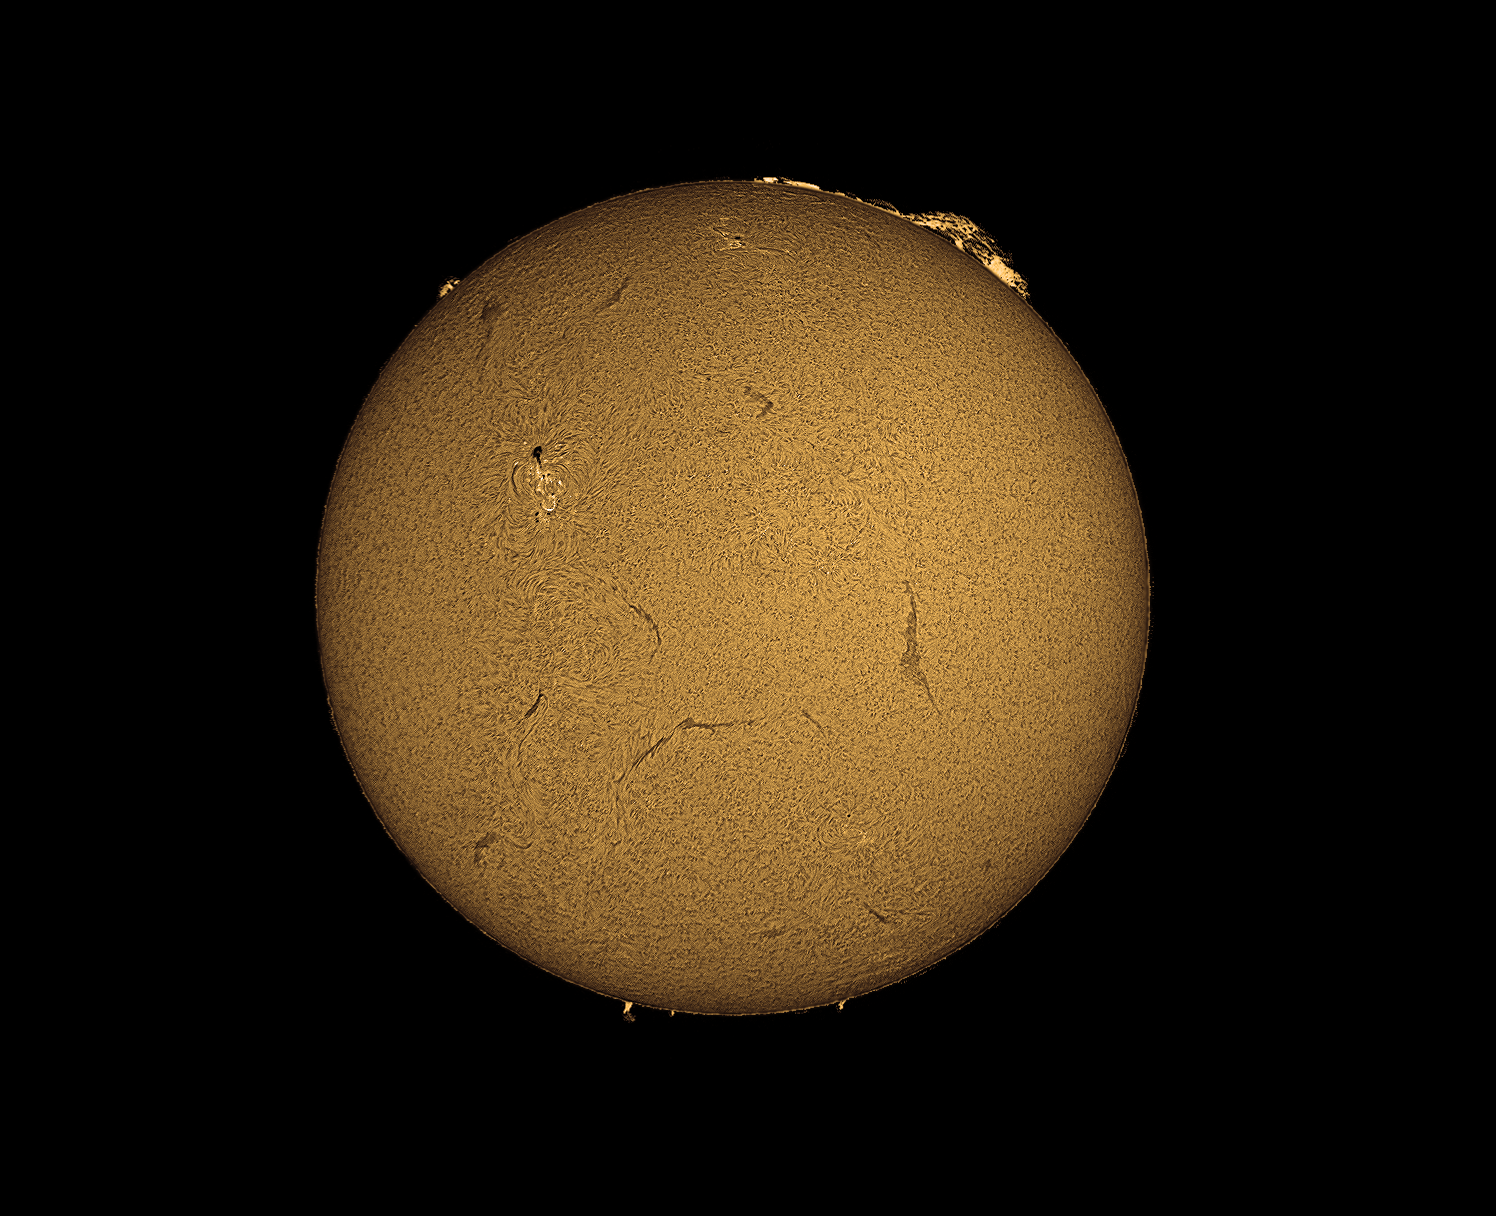 Sun - Our nearest star imaged with a 60mm Coronado Solarmax telescope and a Celestron Skyris 274mono camera.